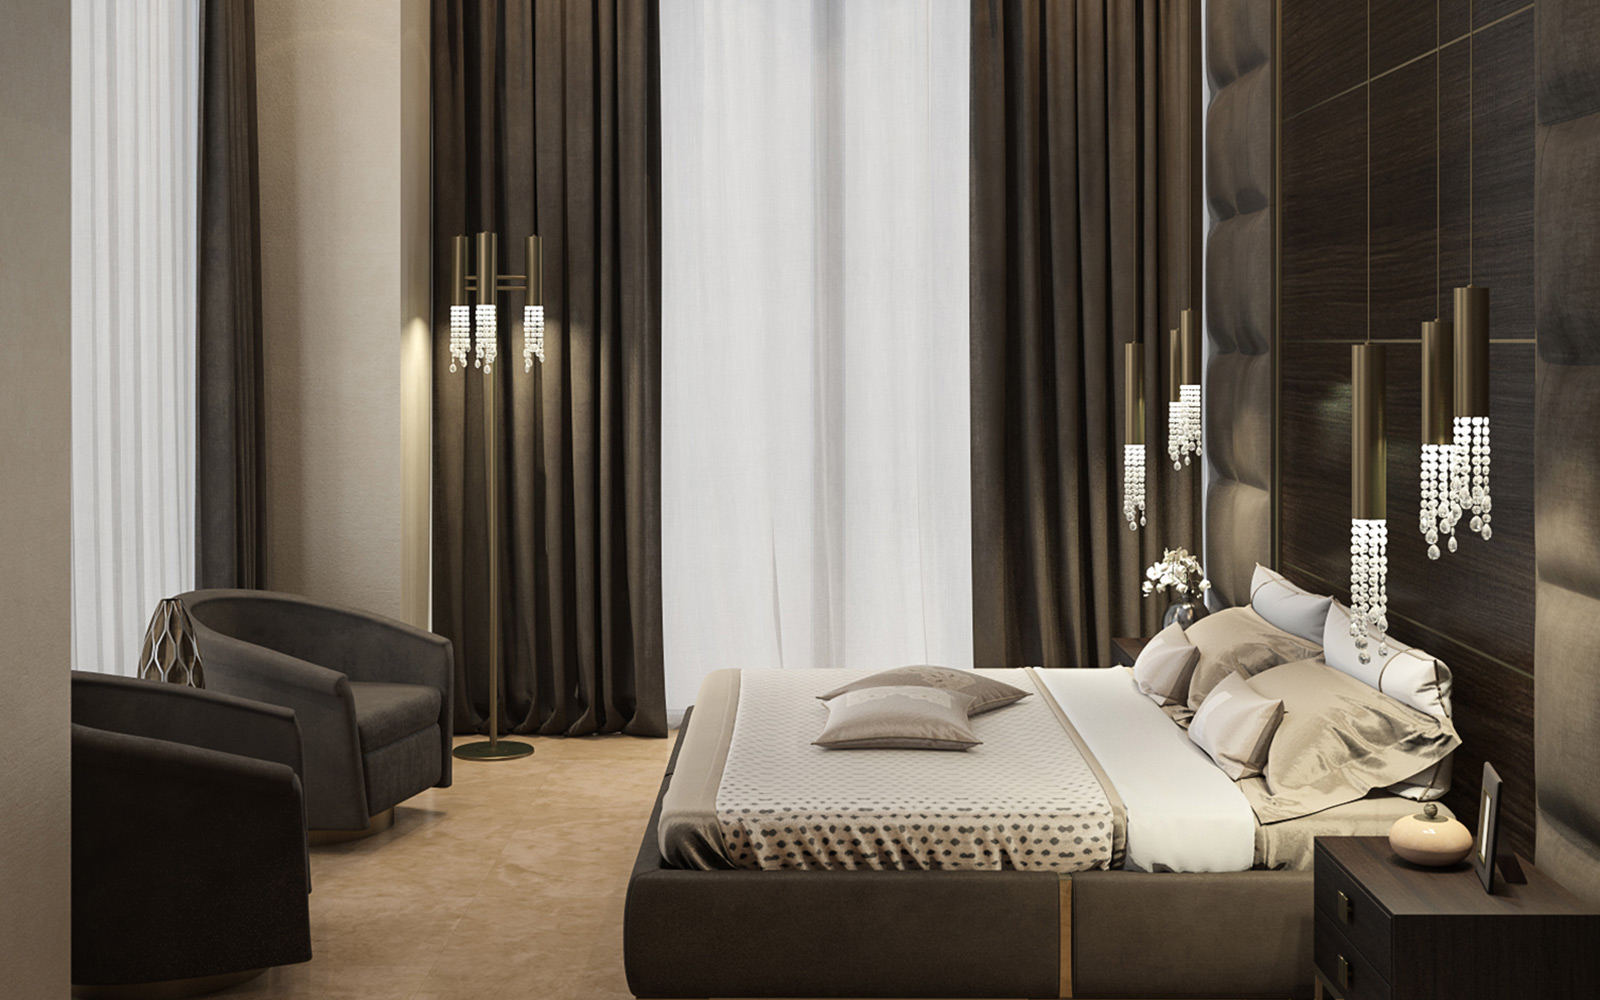 Vogue Design - Istanbul Basaksehir Flat5